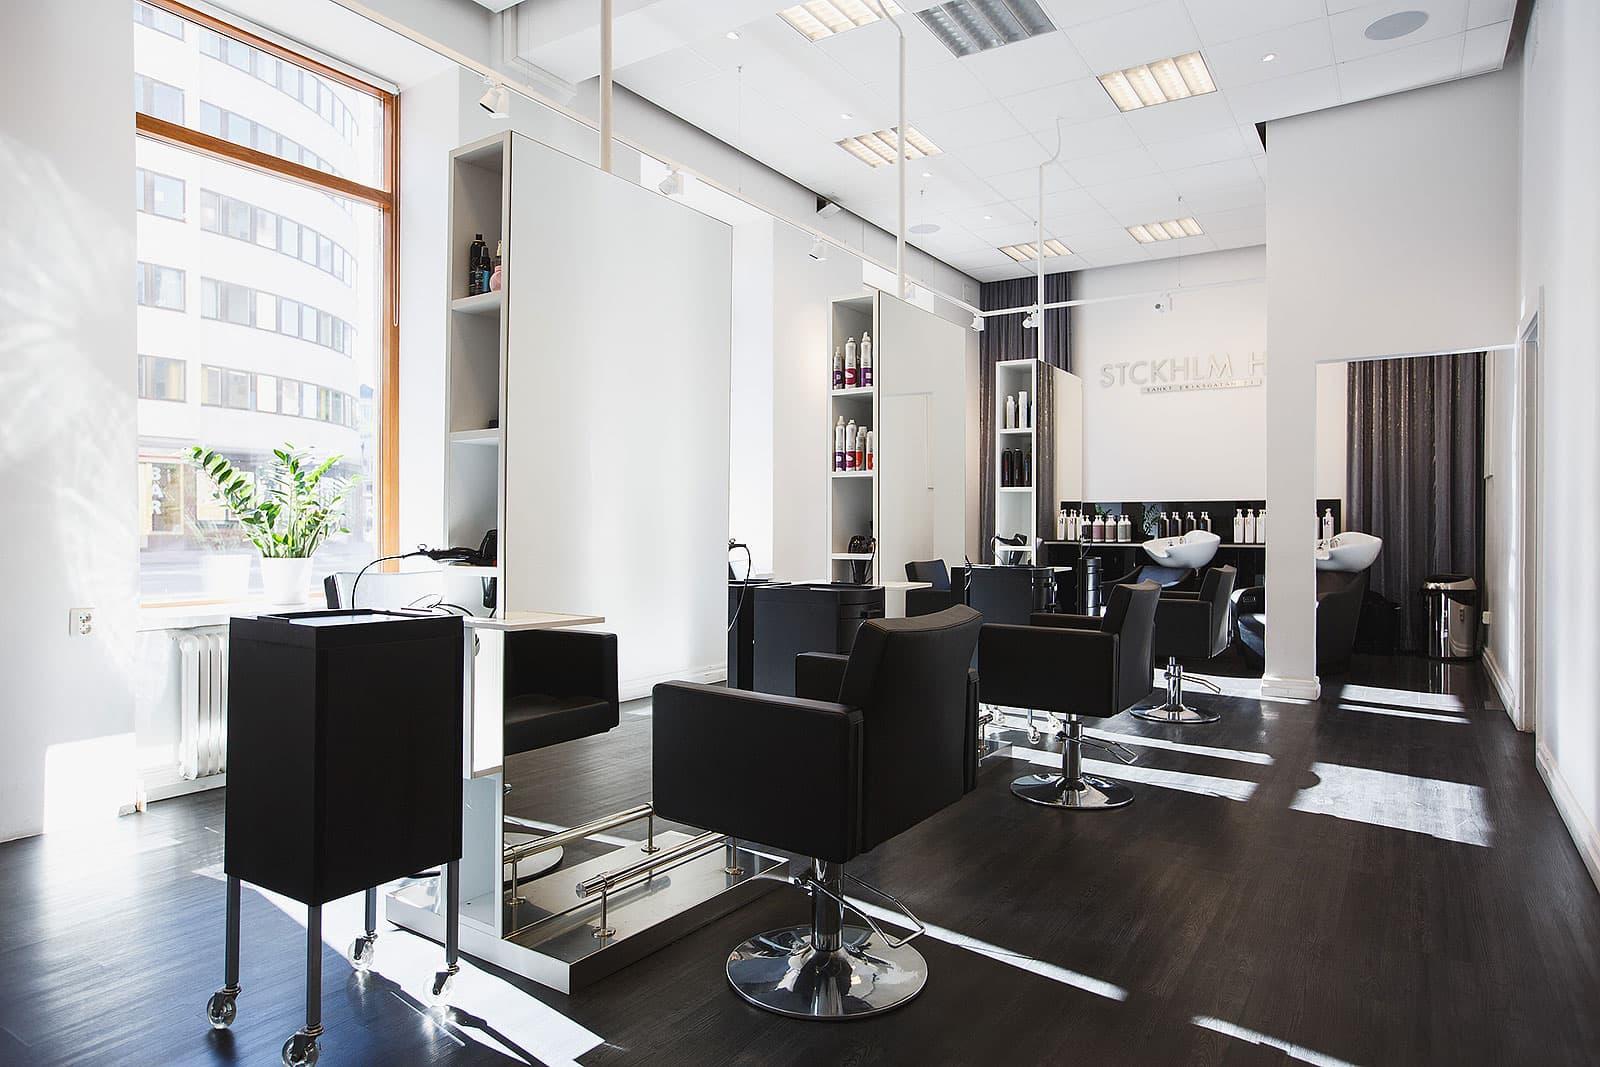 klippa håret stockholm